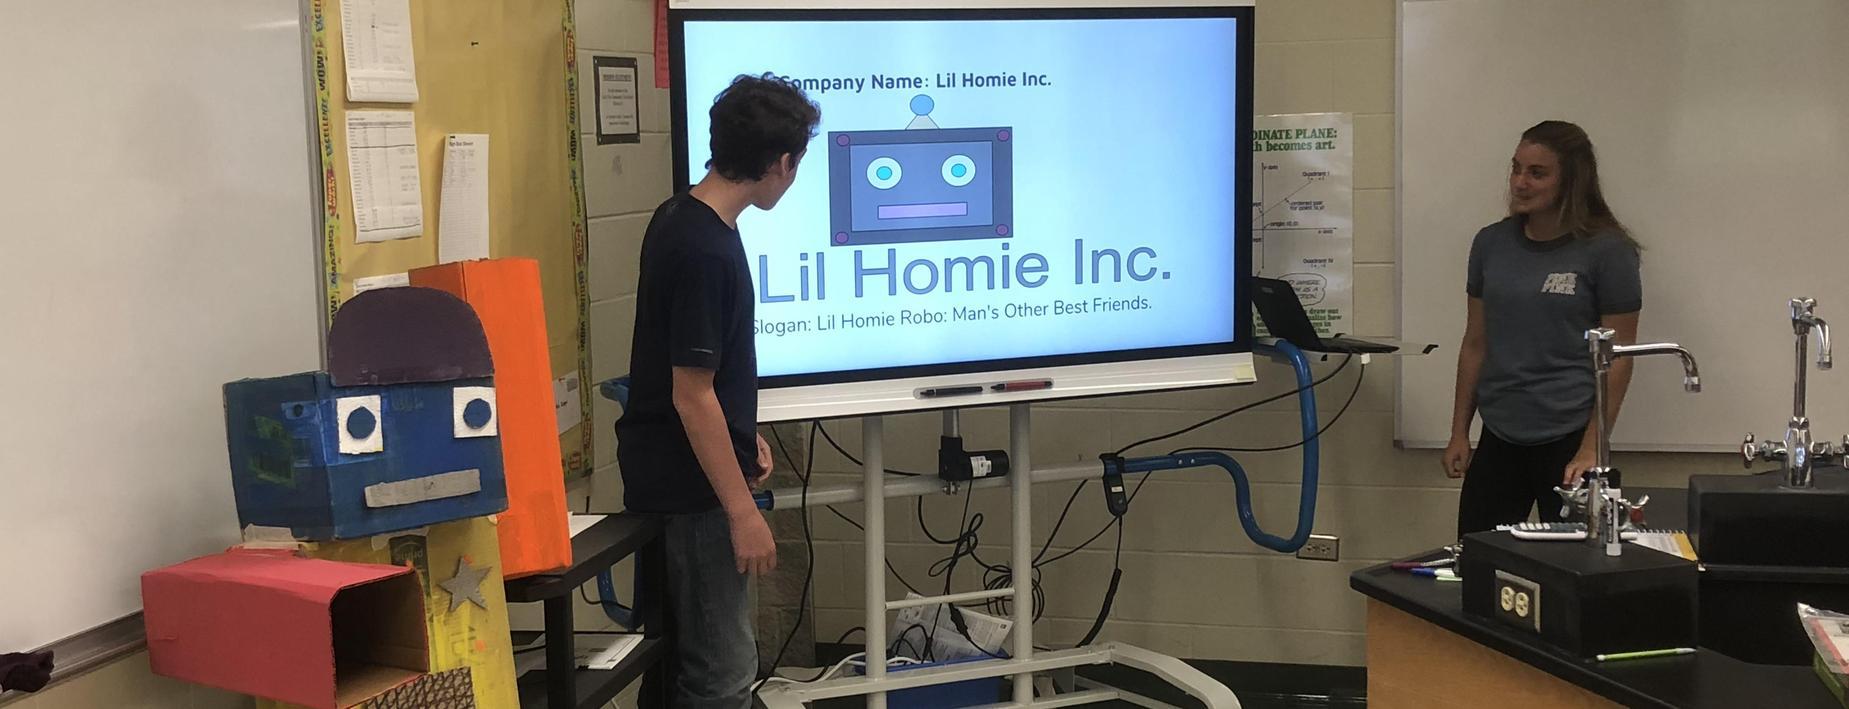 Using a smartboard for a class presentation